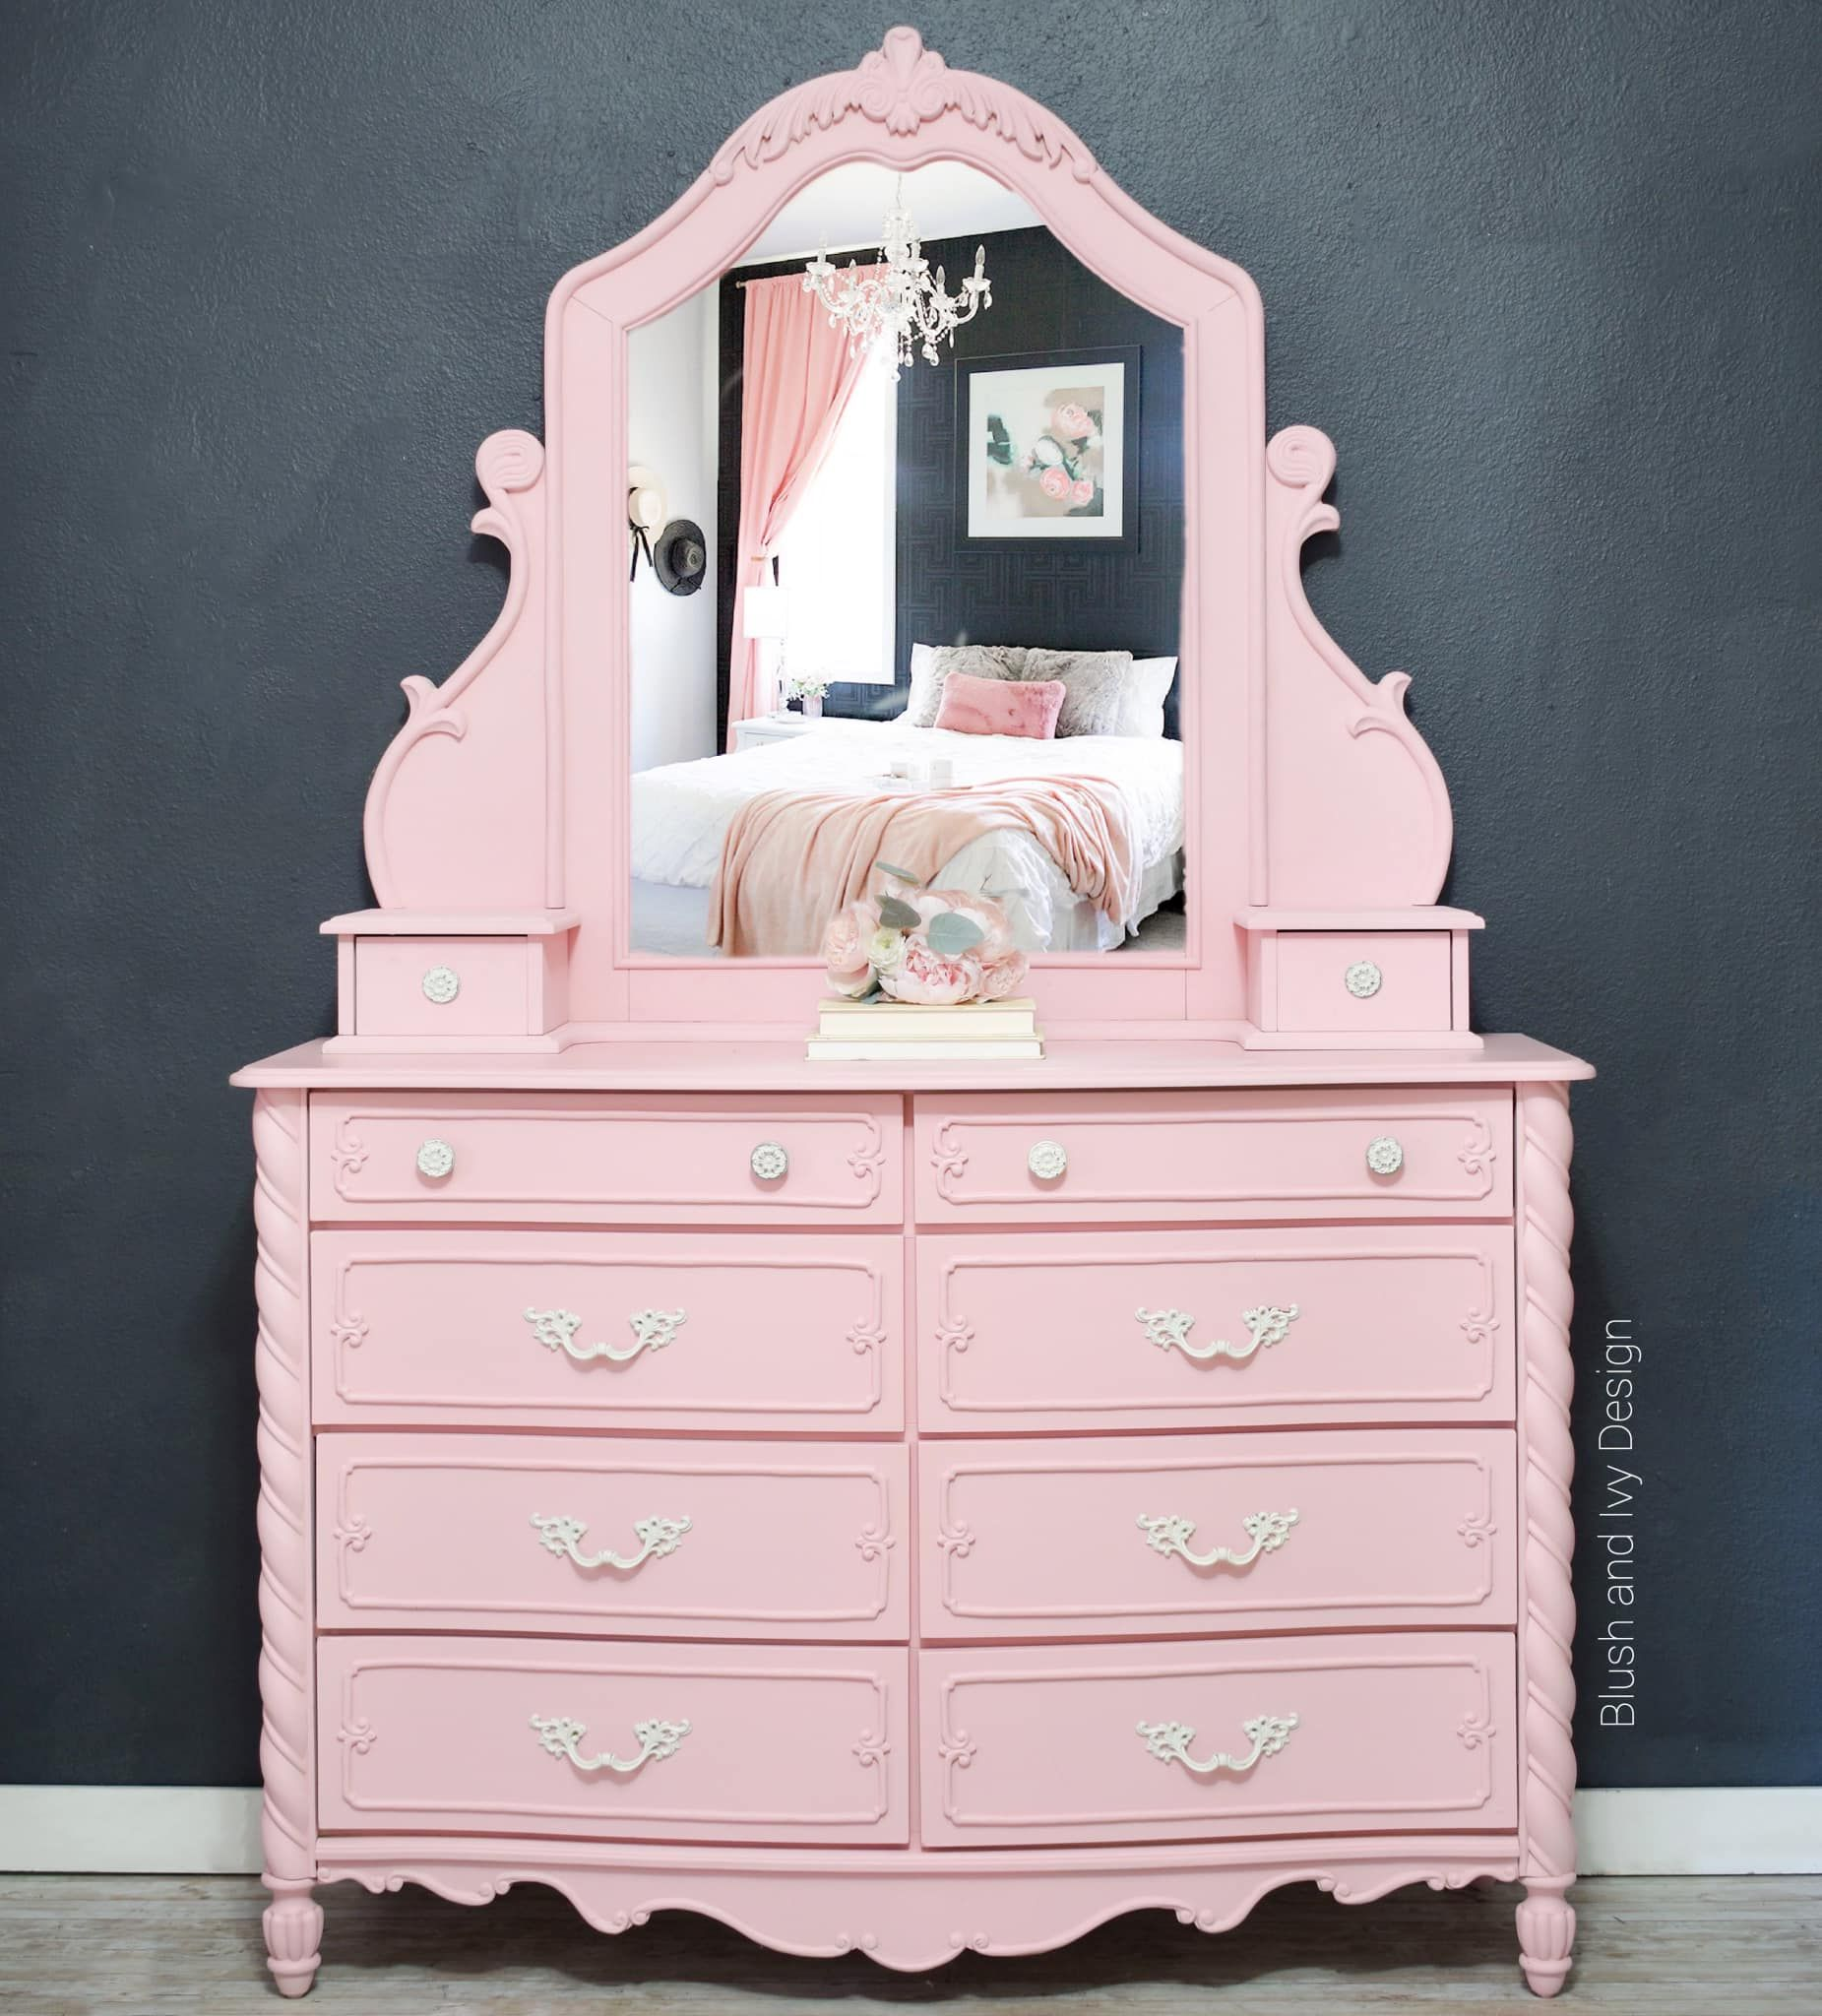 Ornate Dresser with Mirror in Vintage Cupcake